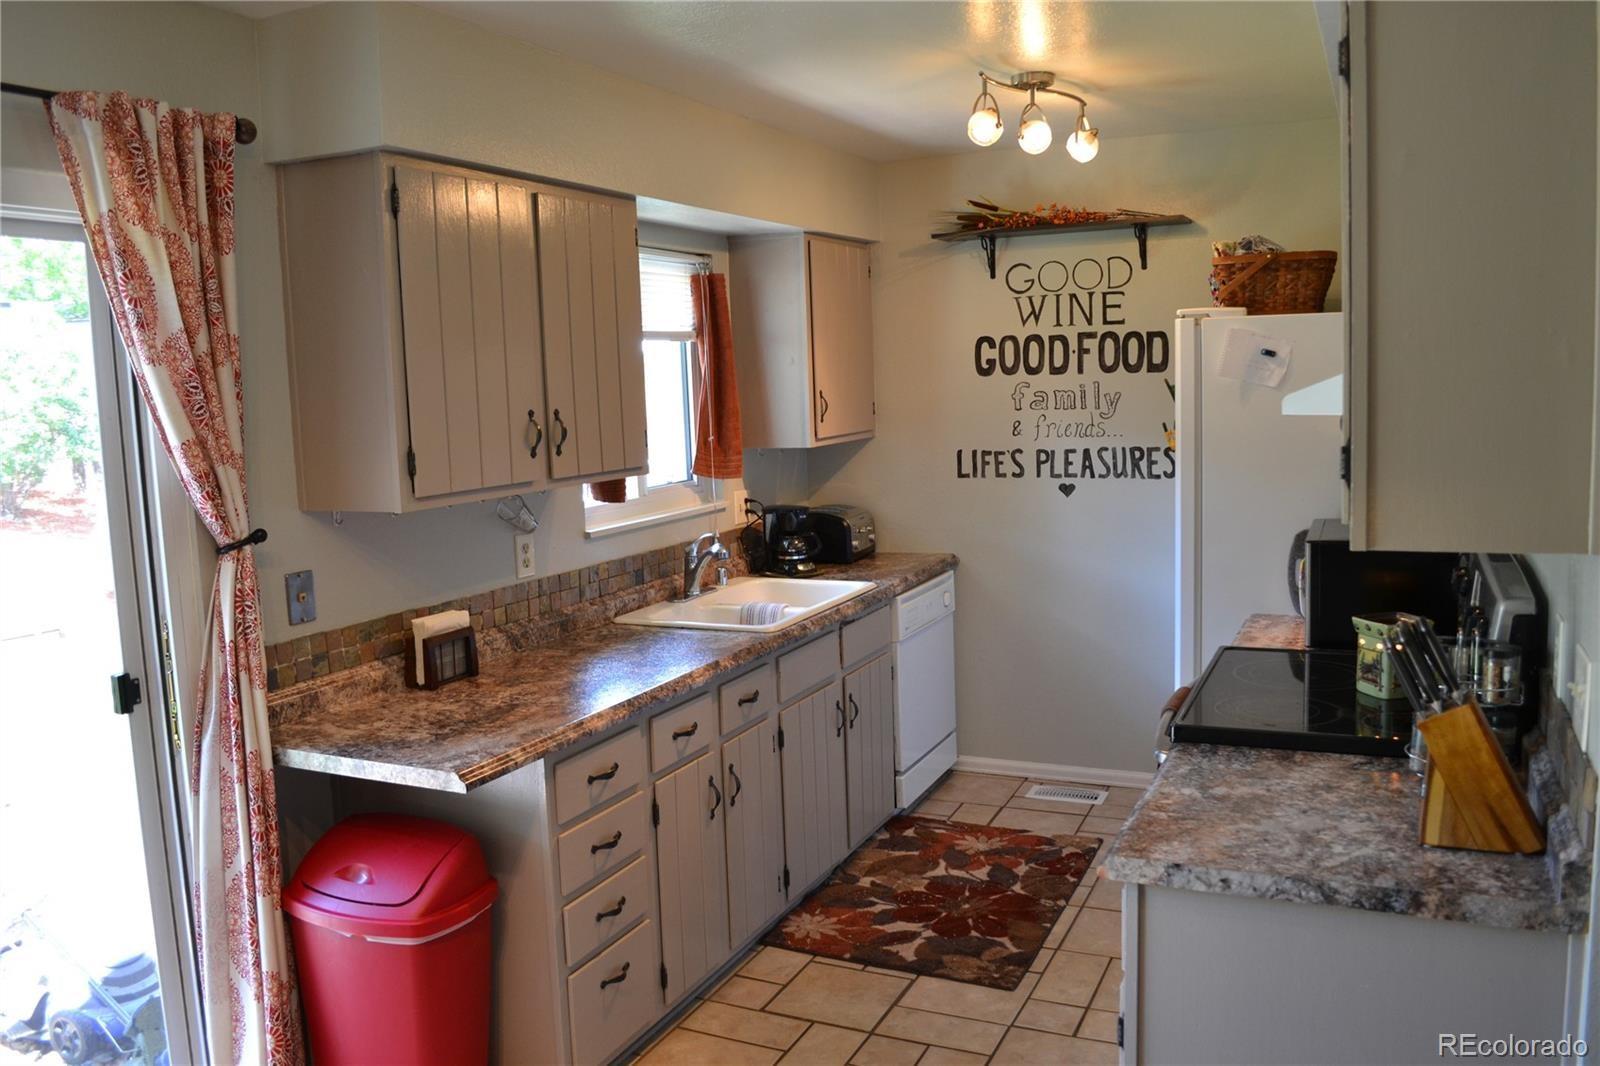 MLS# 4486712 - 3 - 5616 Trout Creek Pass Drive, Colorado Springs, CO 80917